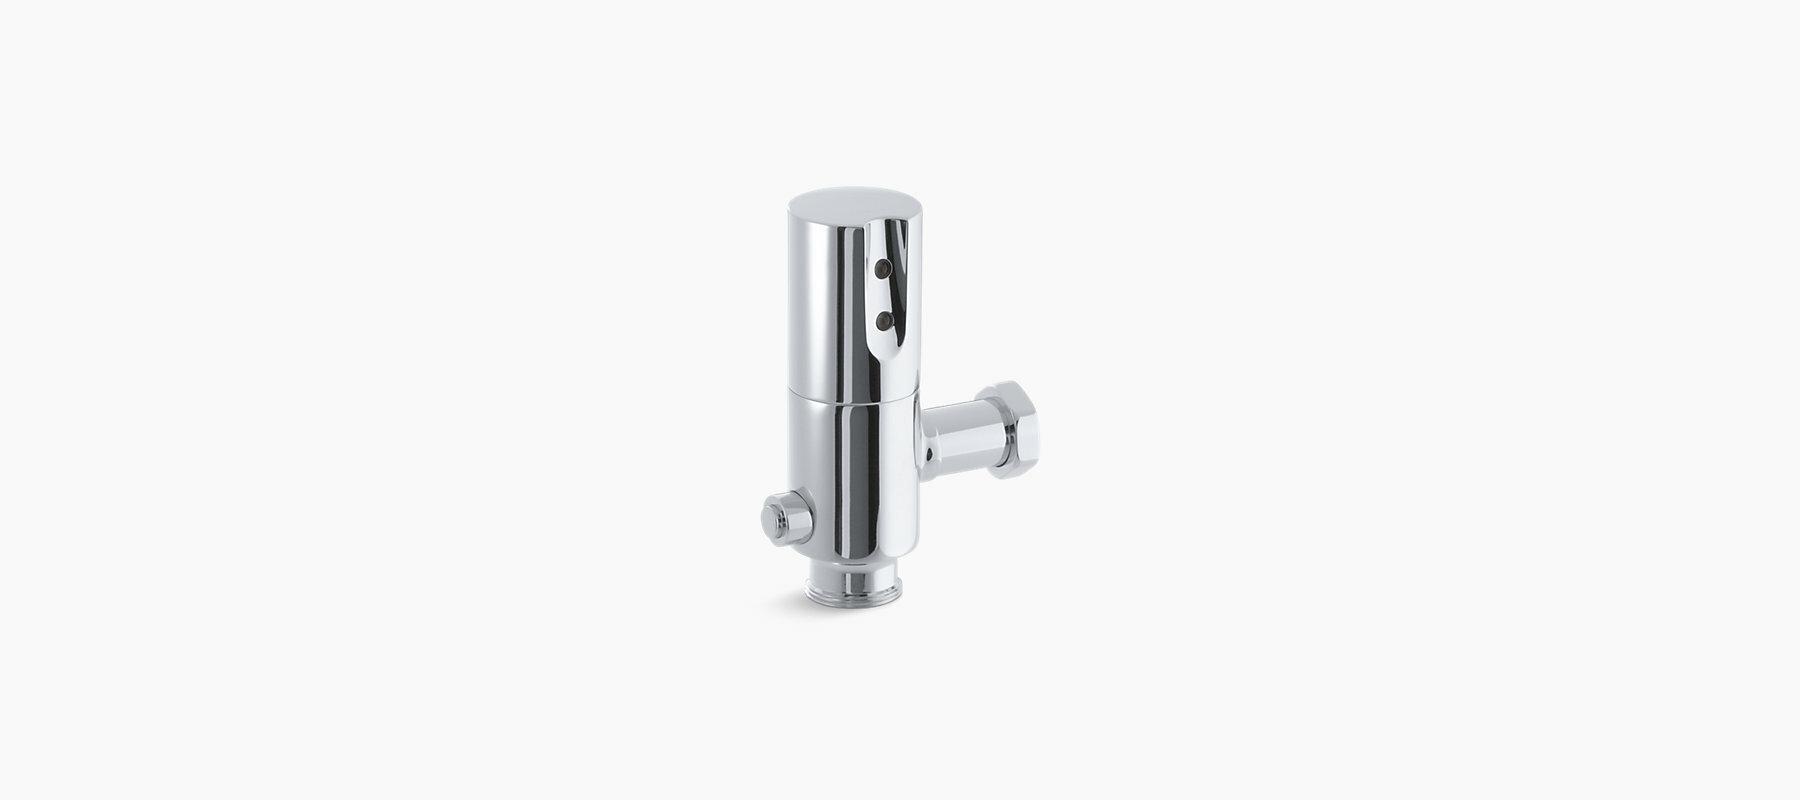 Kohler Tripoint Exposed Hybrid 05 Gpf Retrofit Flushometer For American Standard Urinal Wiring Diagram Installation Wayfair